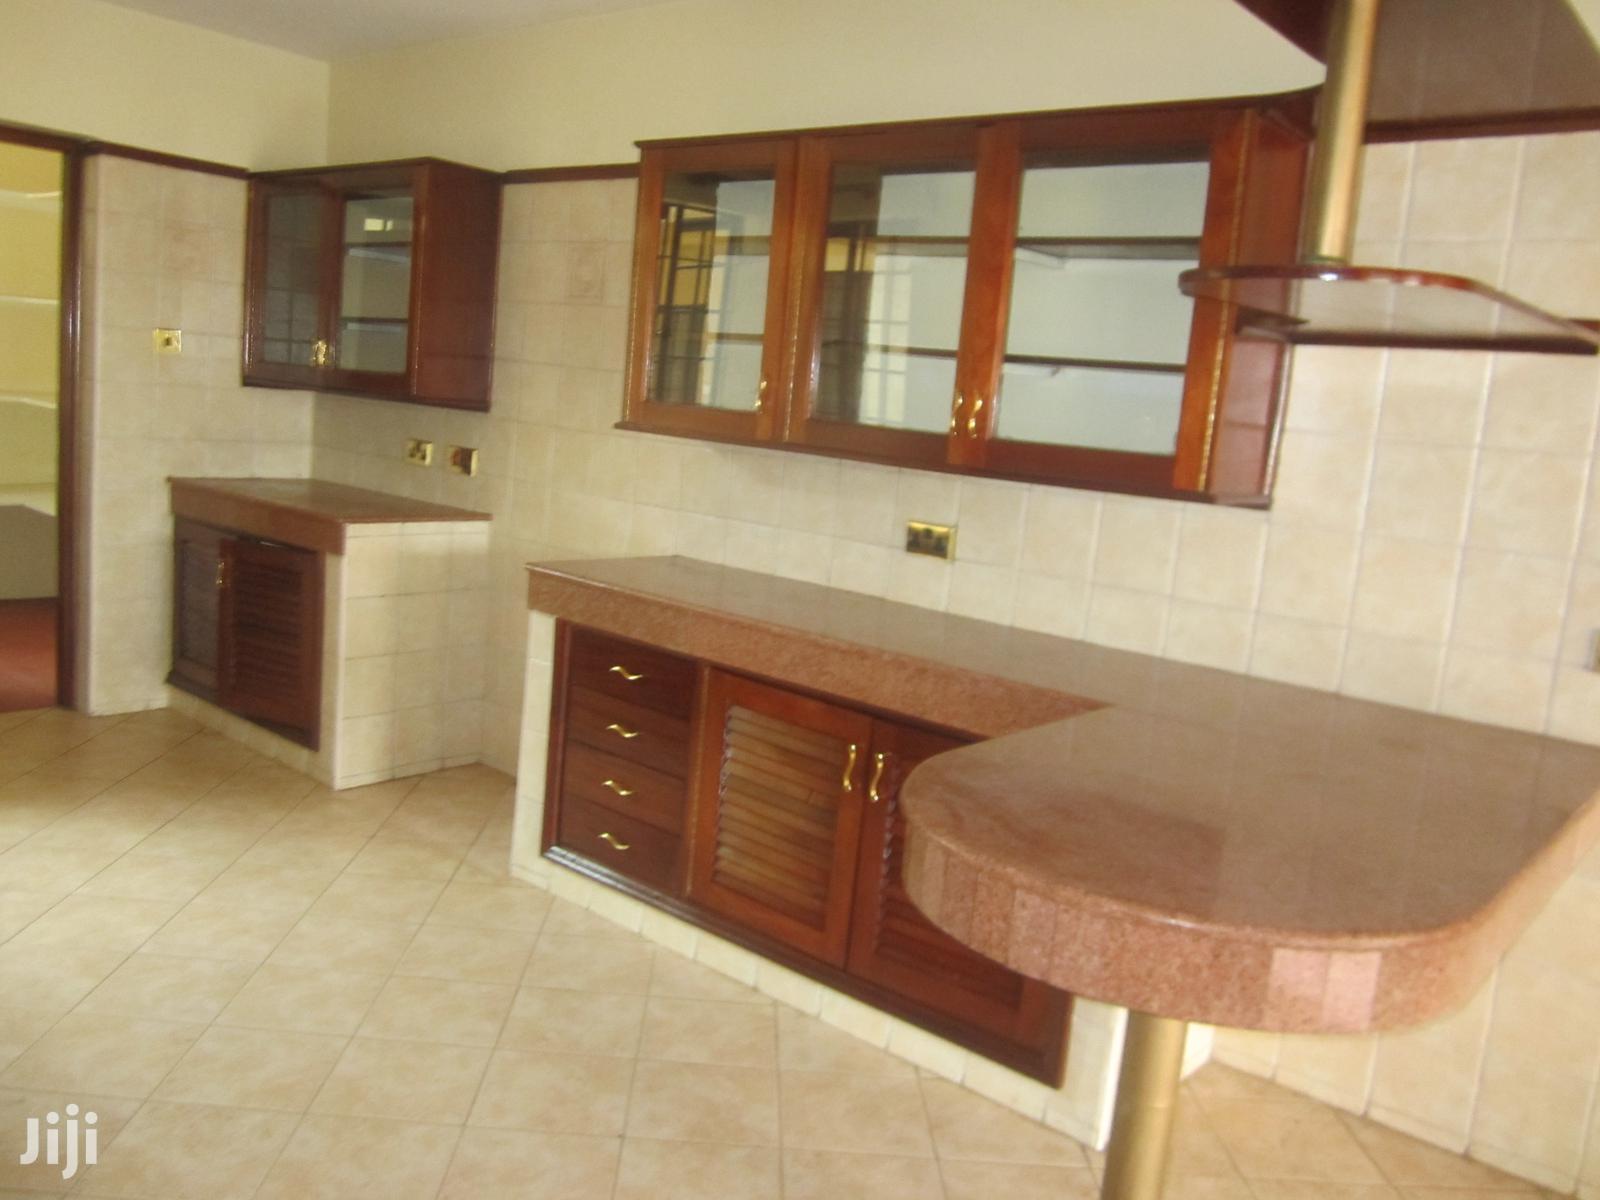 Archive: 4 Bedroom Duplex Apartment In Lavington To Let